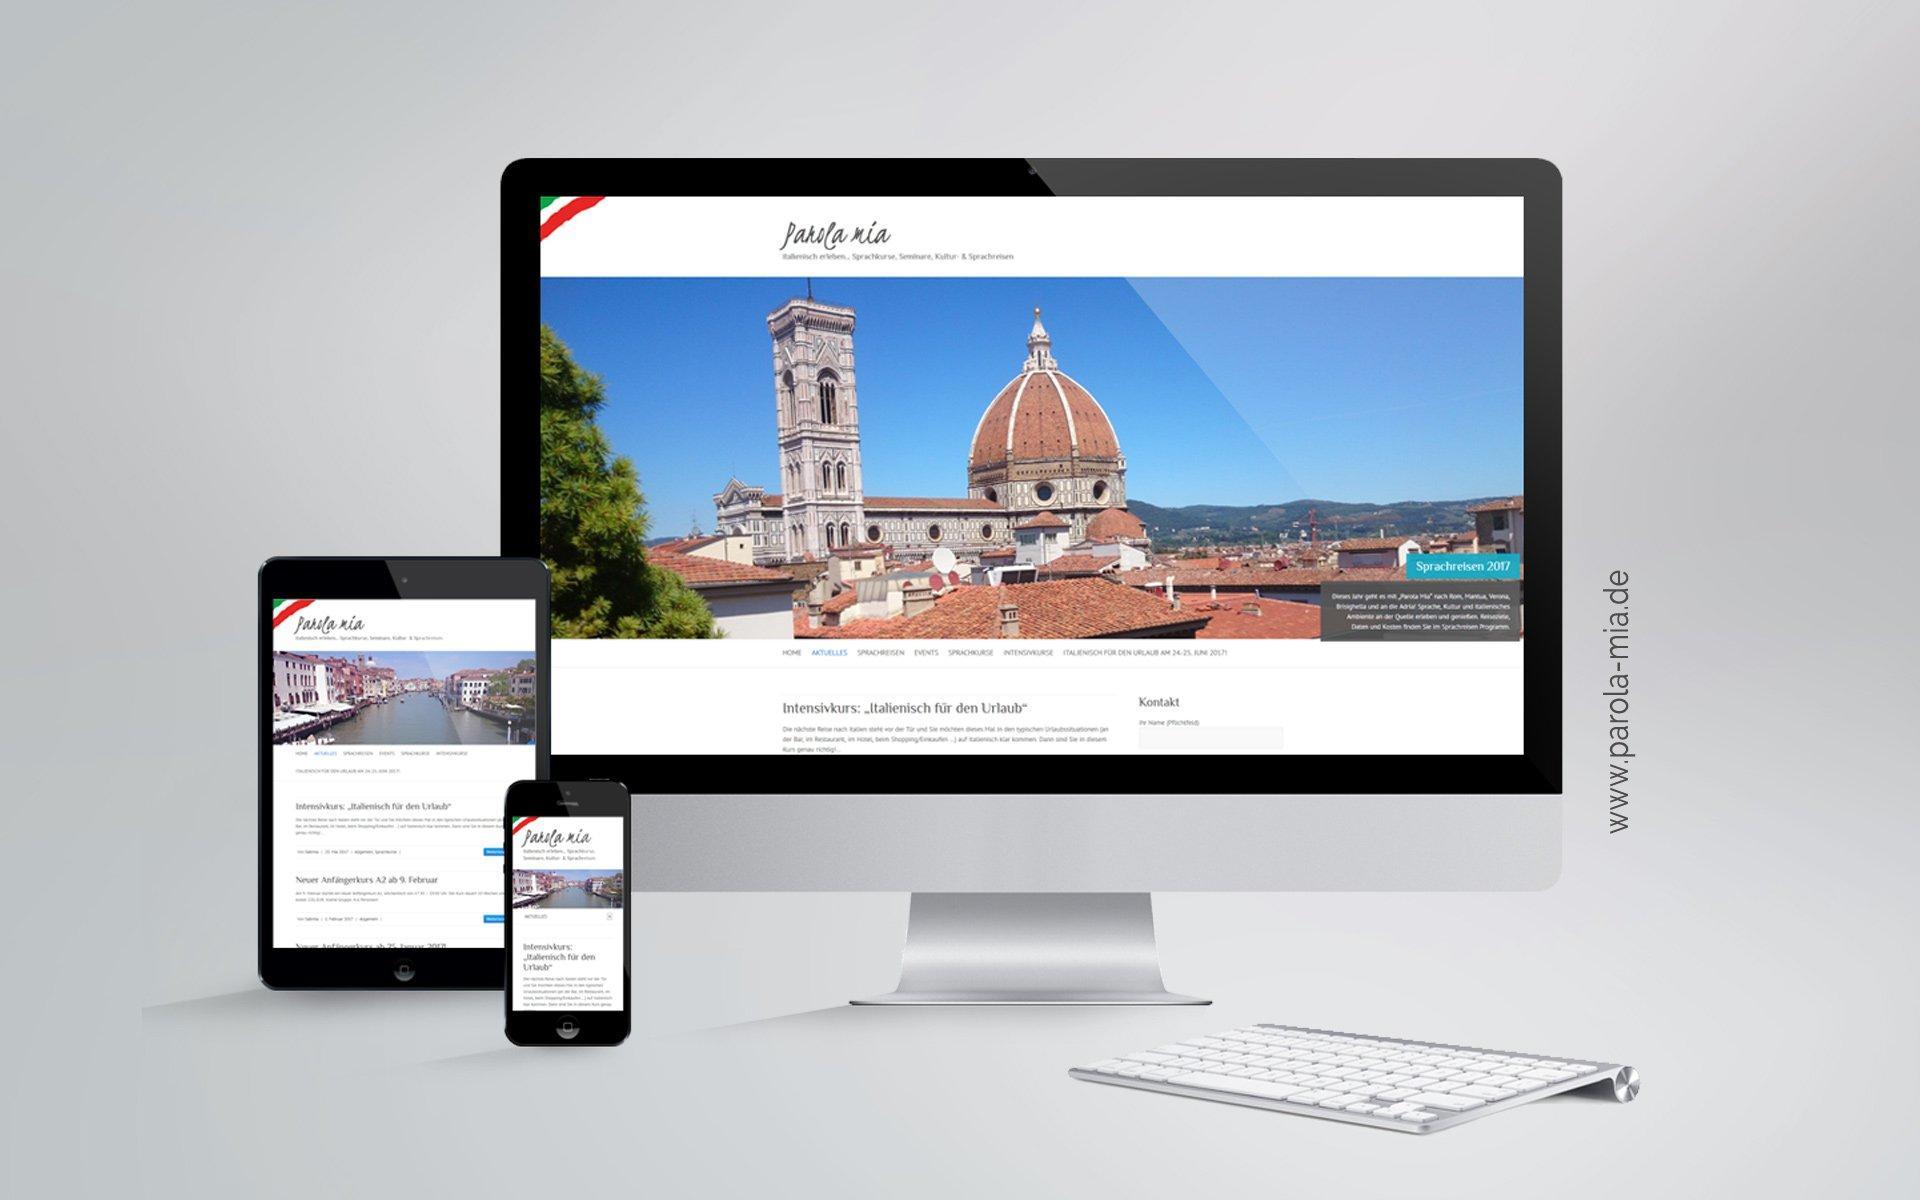 Webdesign Mockup parola-mia